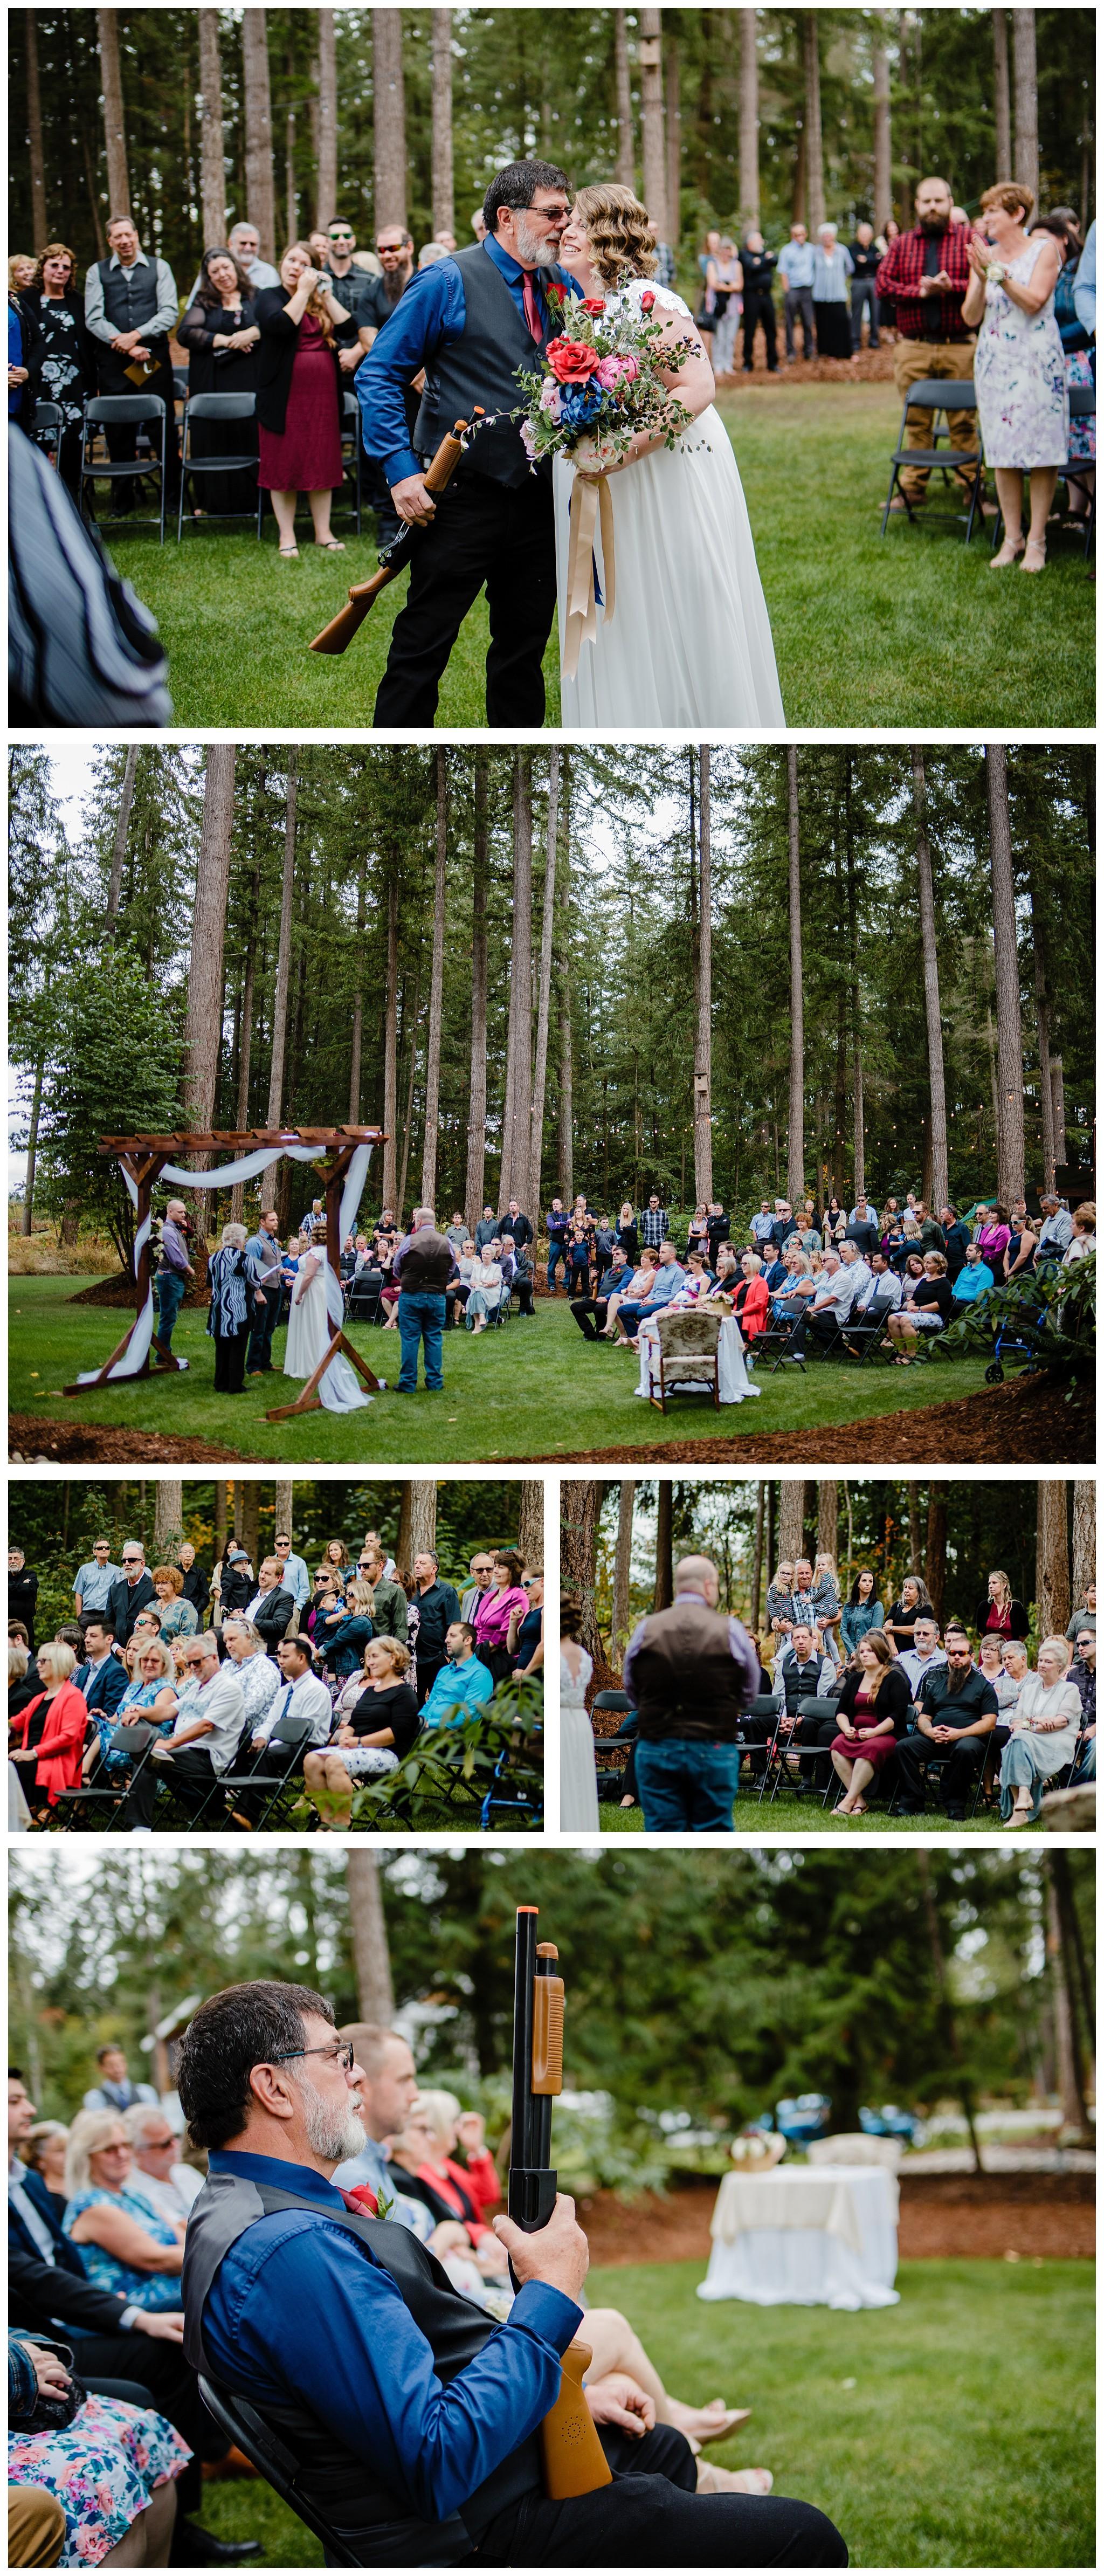 Aldergrove Park Fall Backyard Wedding Photographer Pregnant Bride Tent Outdoor BC Canada Best Wedding Photographer_0036.jpg